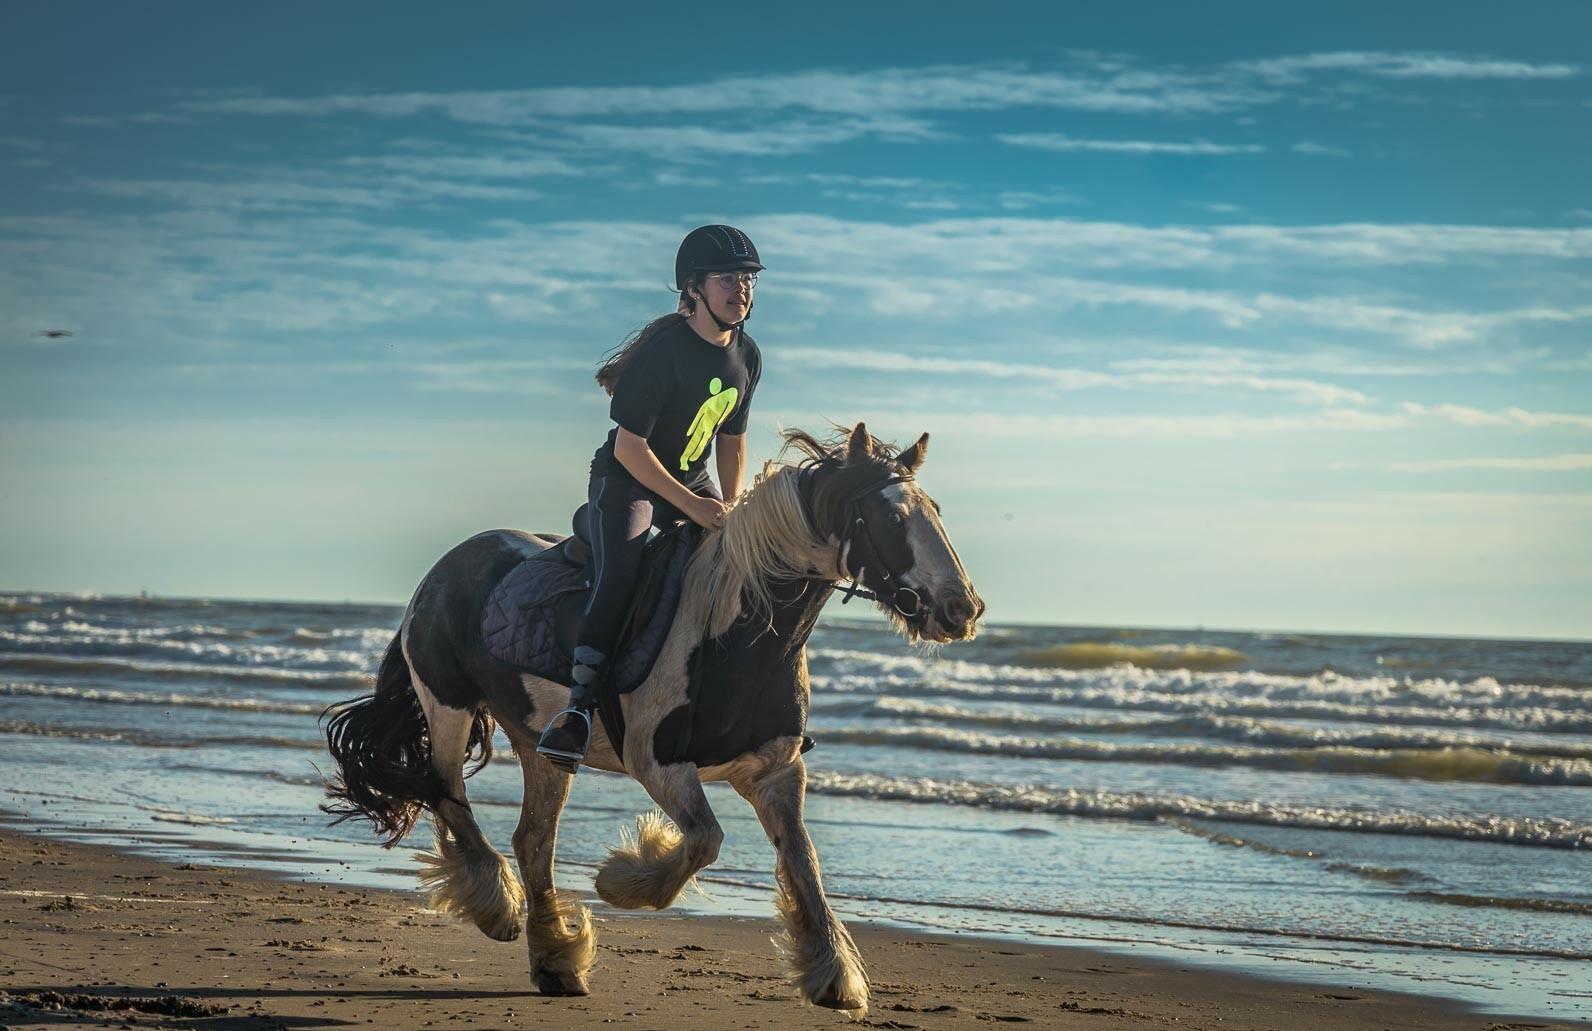 Strandrit met paard op Texel VVV Texel Iris Borst